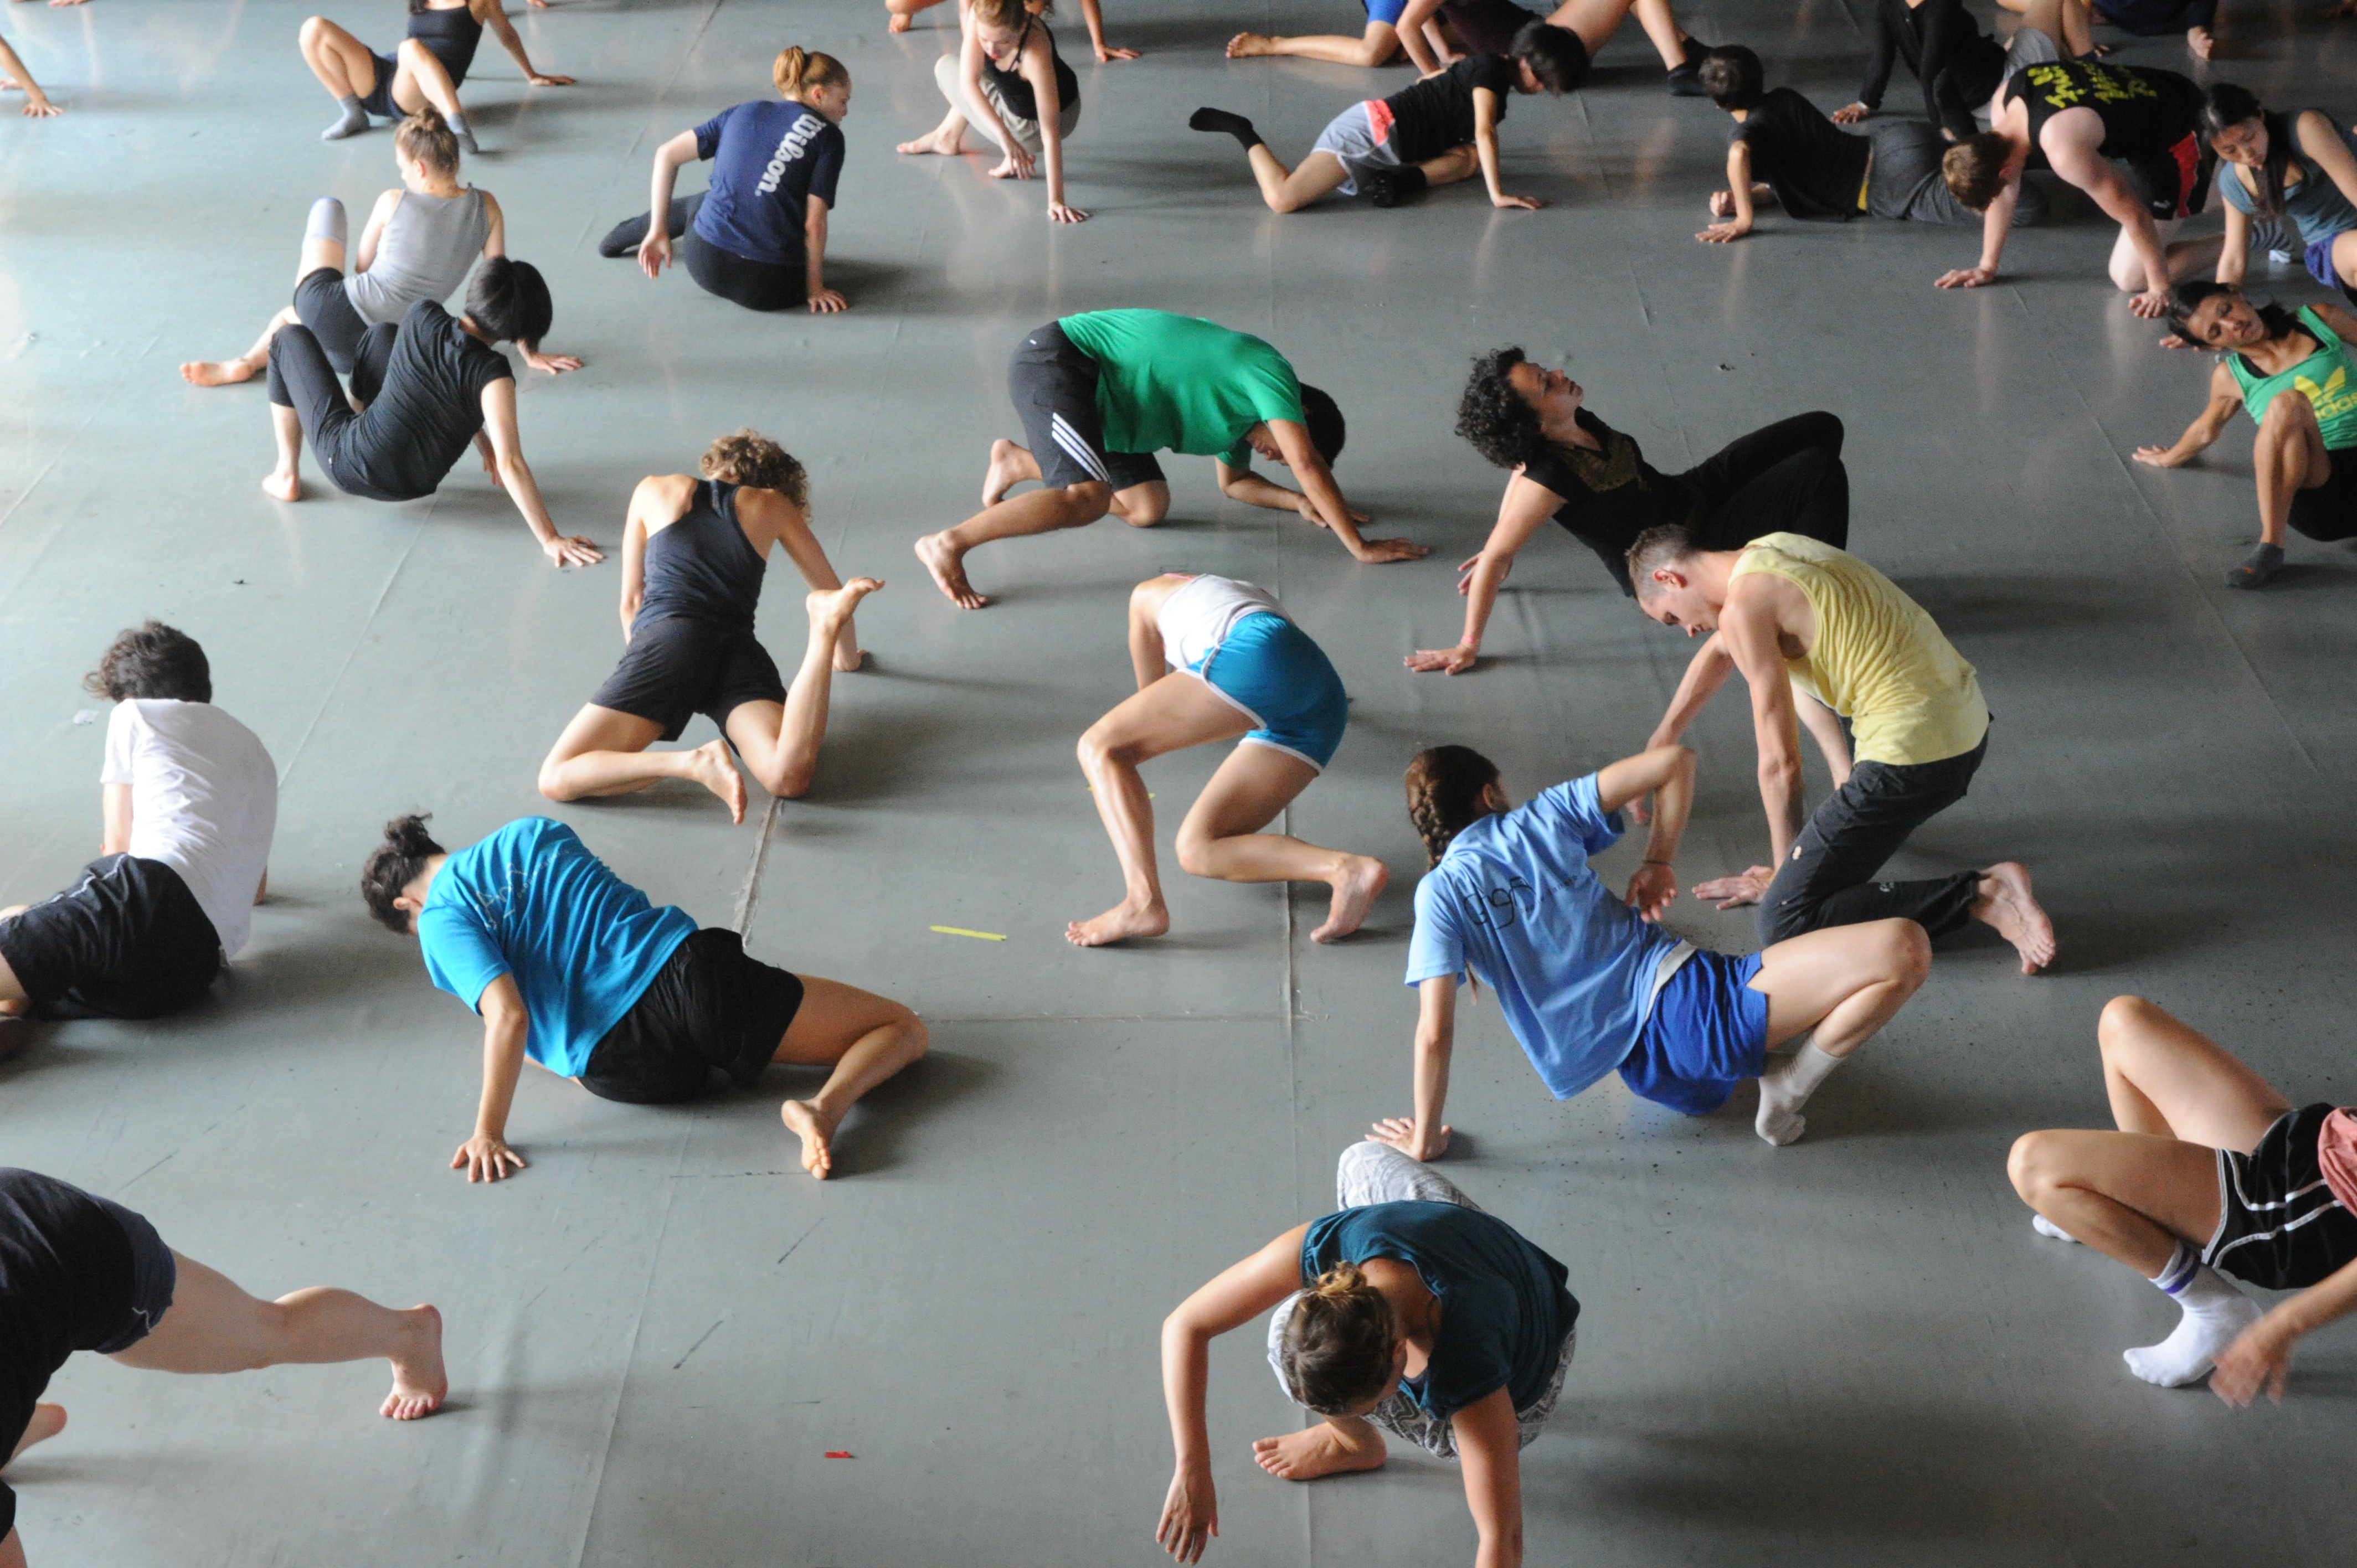 DSC_4761 - Dancers - Gadi Dagon